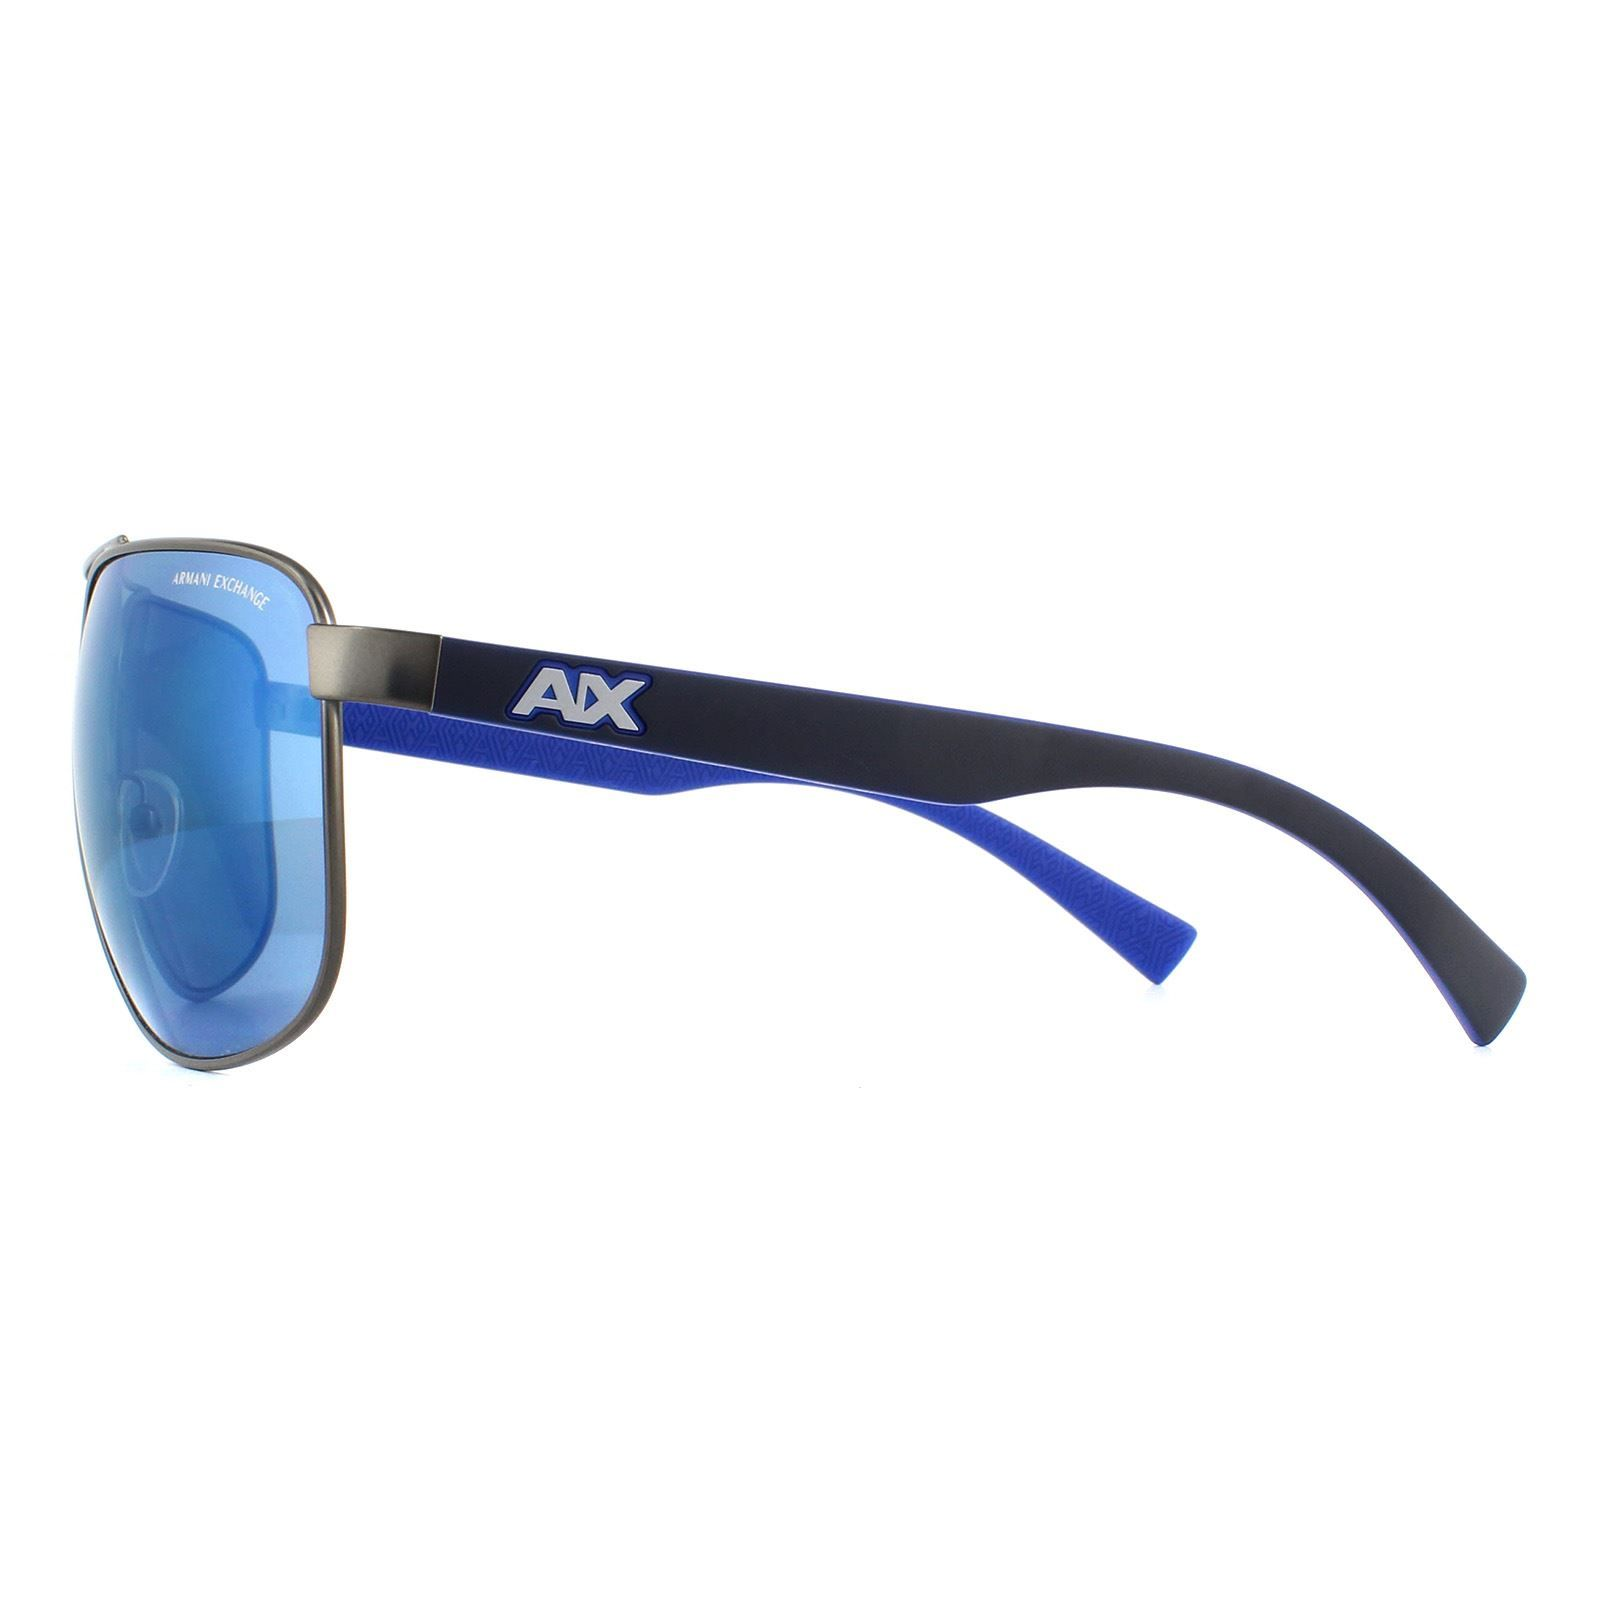 Armani Exchange Sunglasses 2026S 608855 Matte Gunmetal Blue Mirror